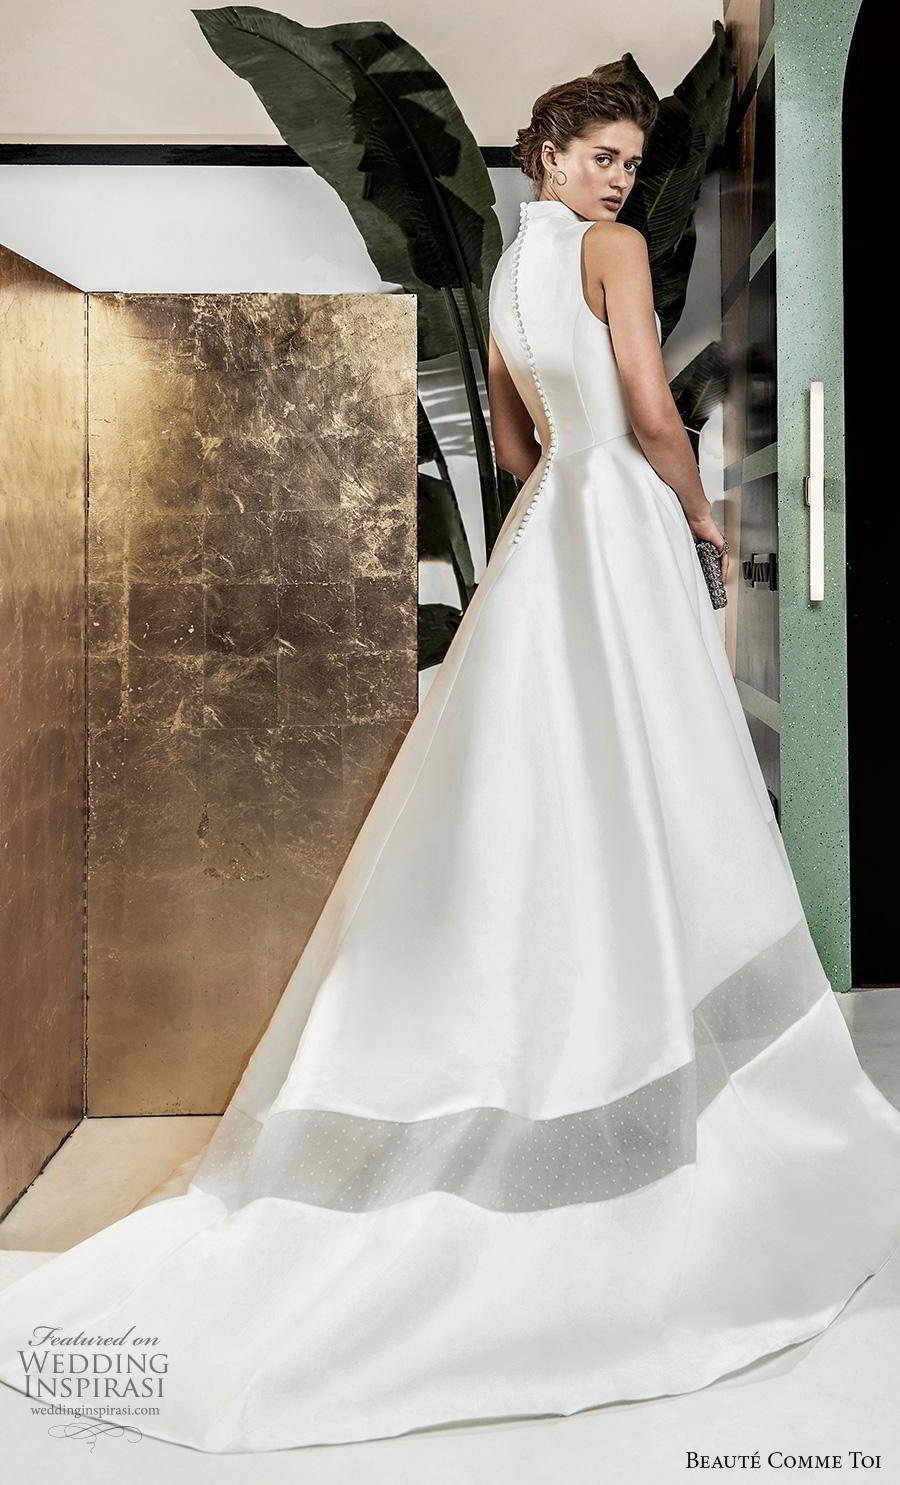 beaute comme toi 2019 bridal sleeveless high neck simple minimalist satin elegant classy a  line wedding dress covered button back chapel train (deborah) bv